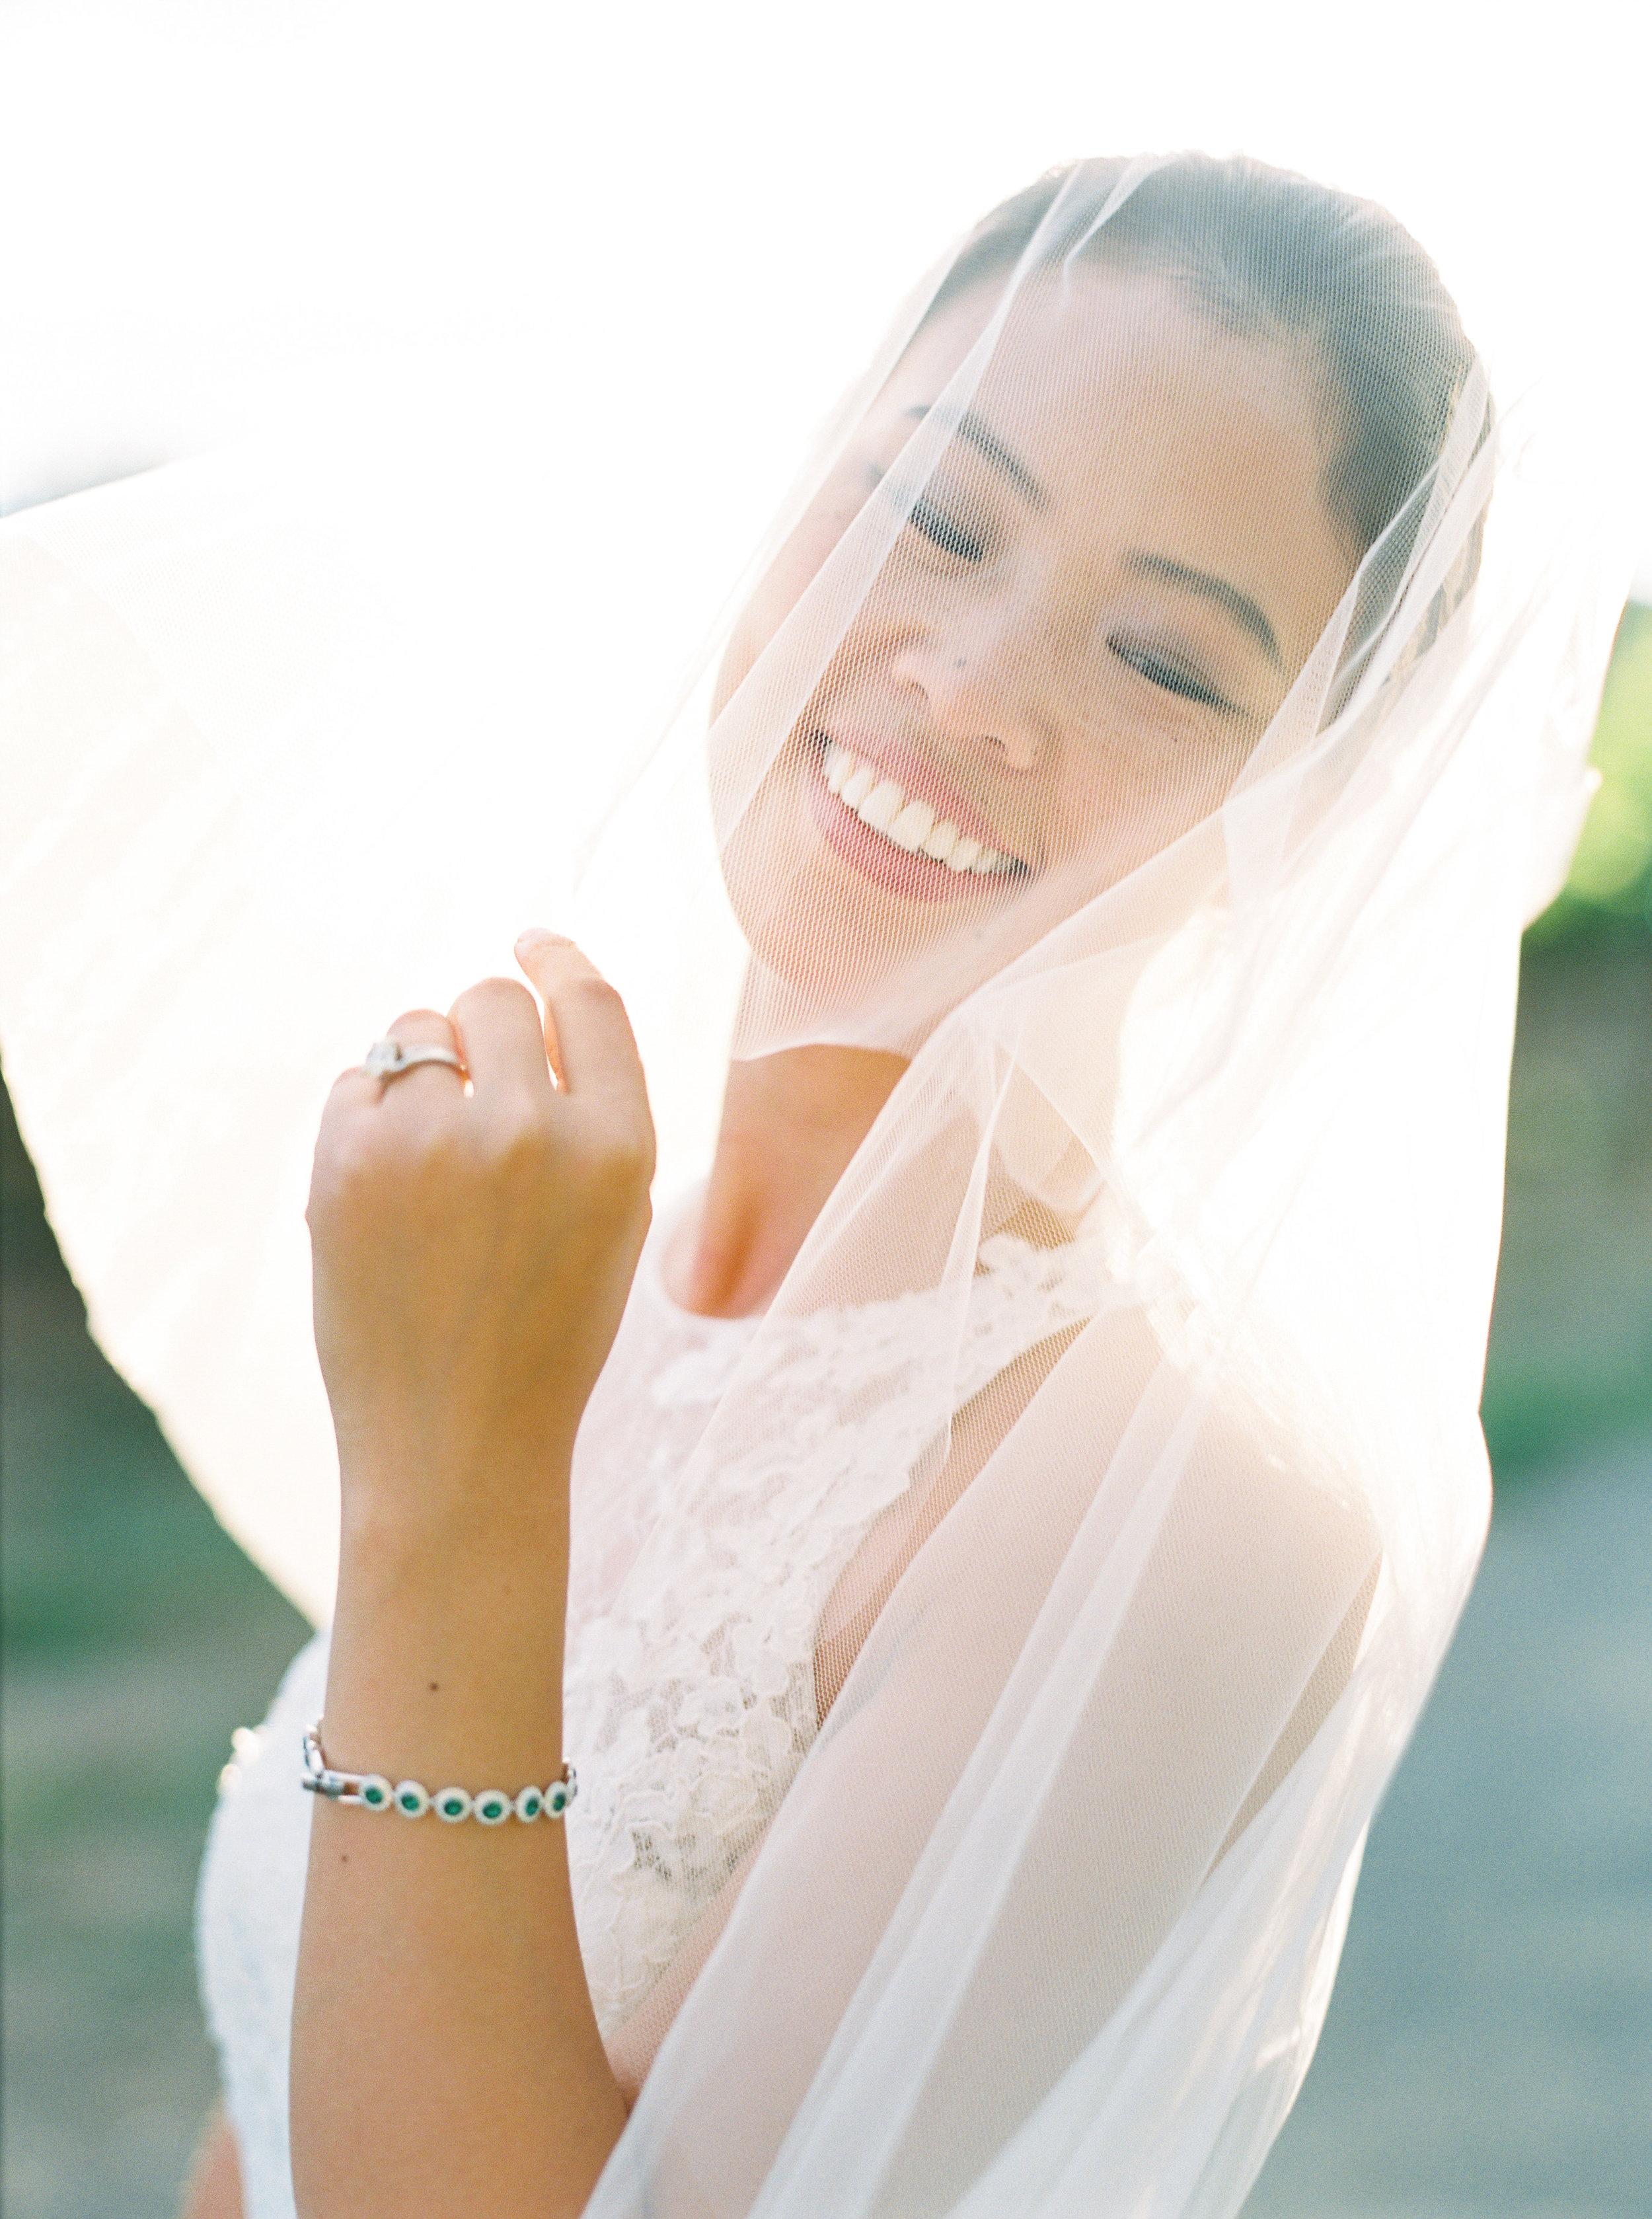 Harvest-inn-wedding-in-napa-california-18.jpg